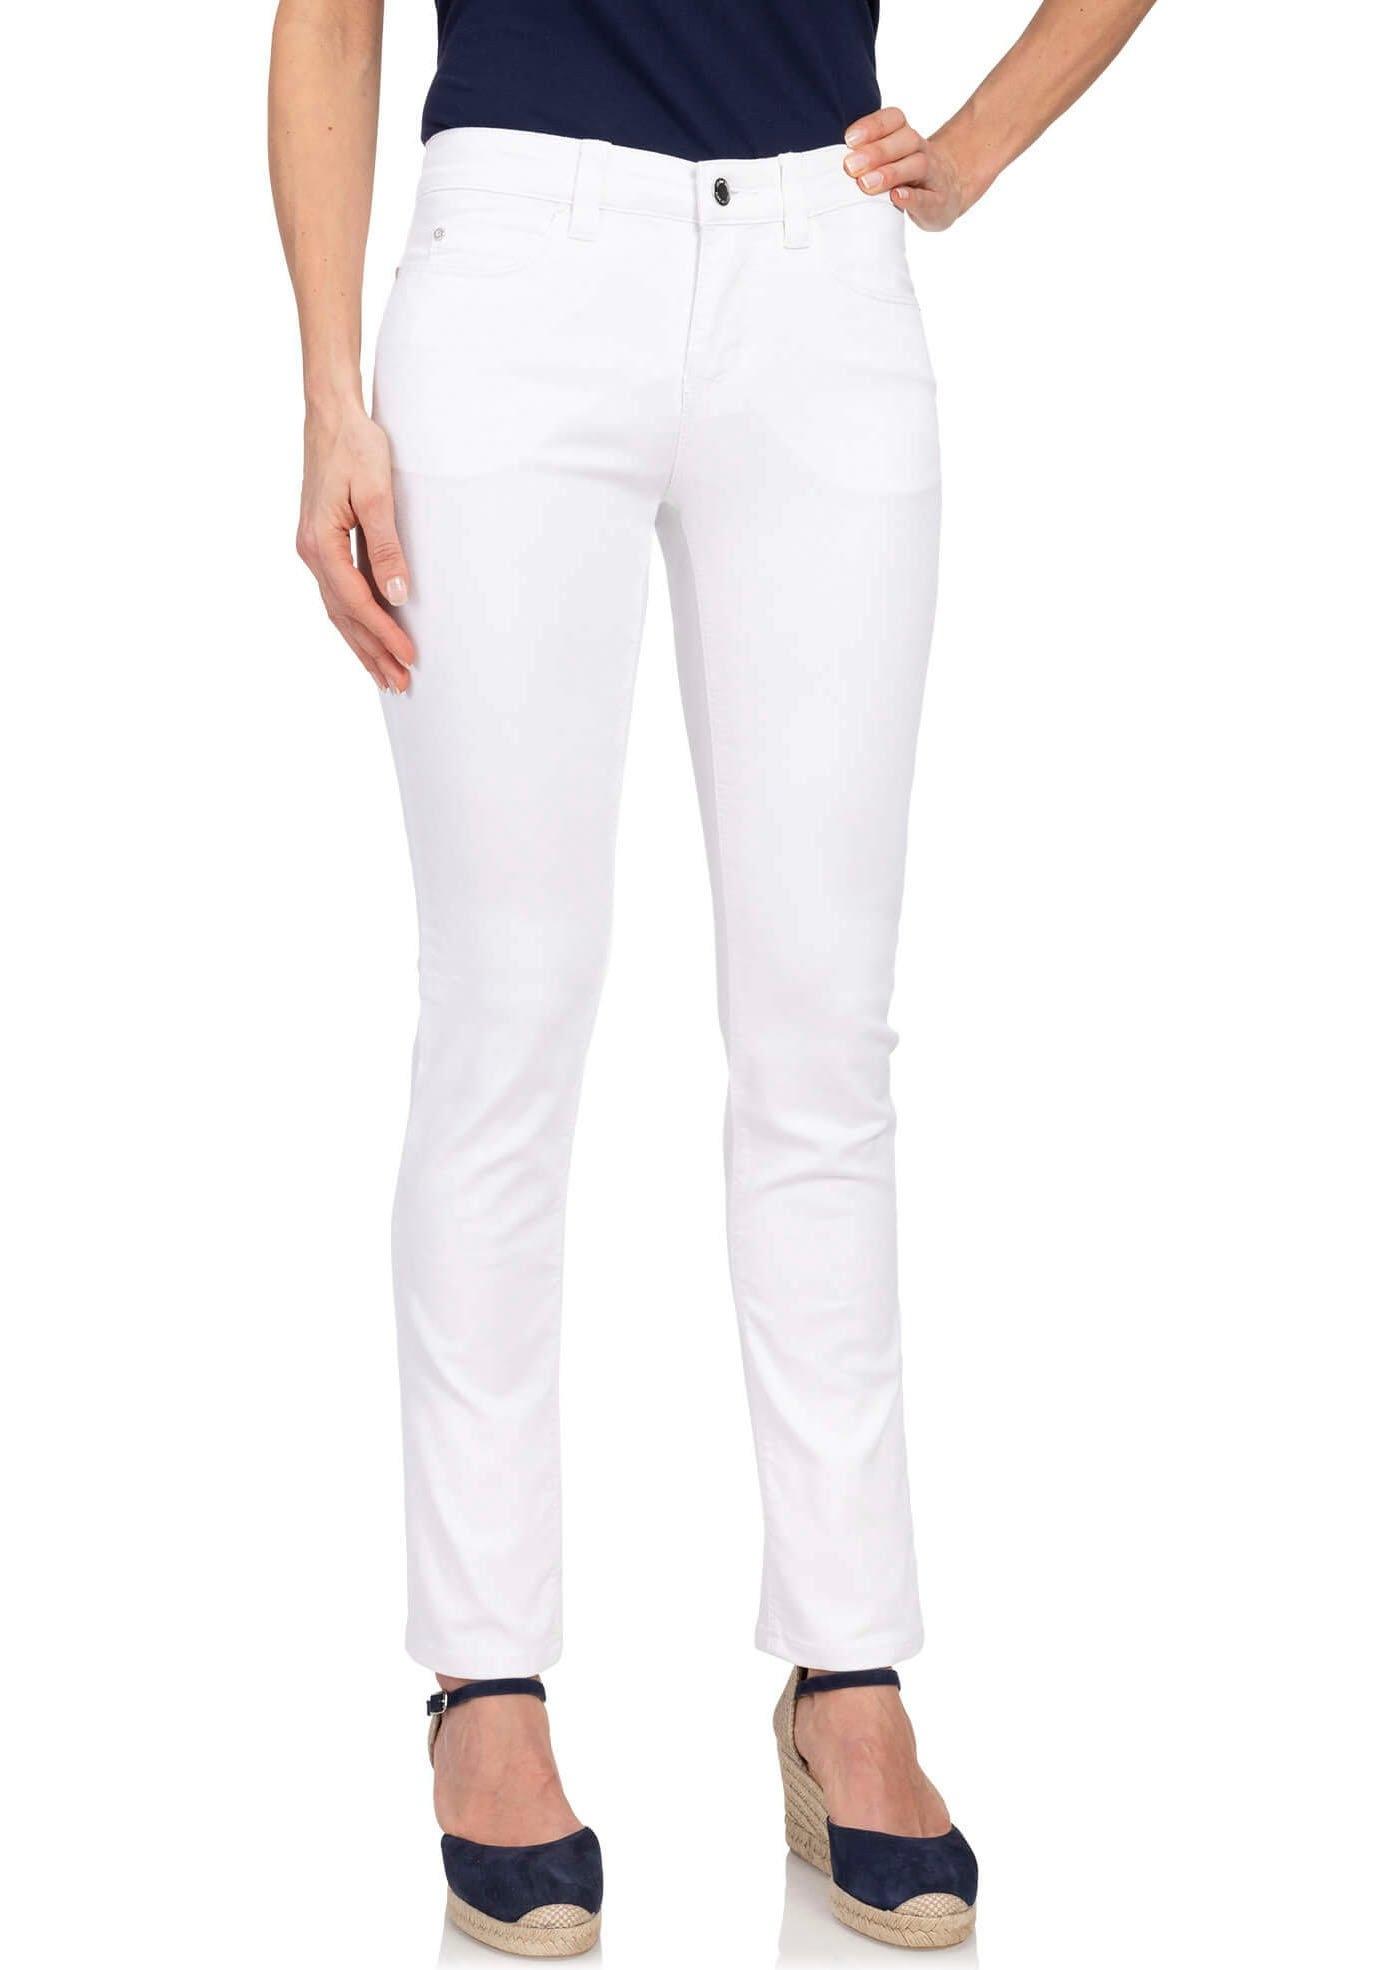 wonderjeans slim fit jeans Classic-Slim Klassiek, recht model veilig op otto.nl kopen